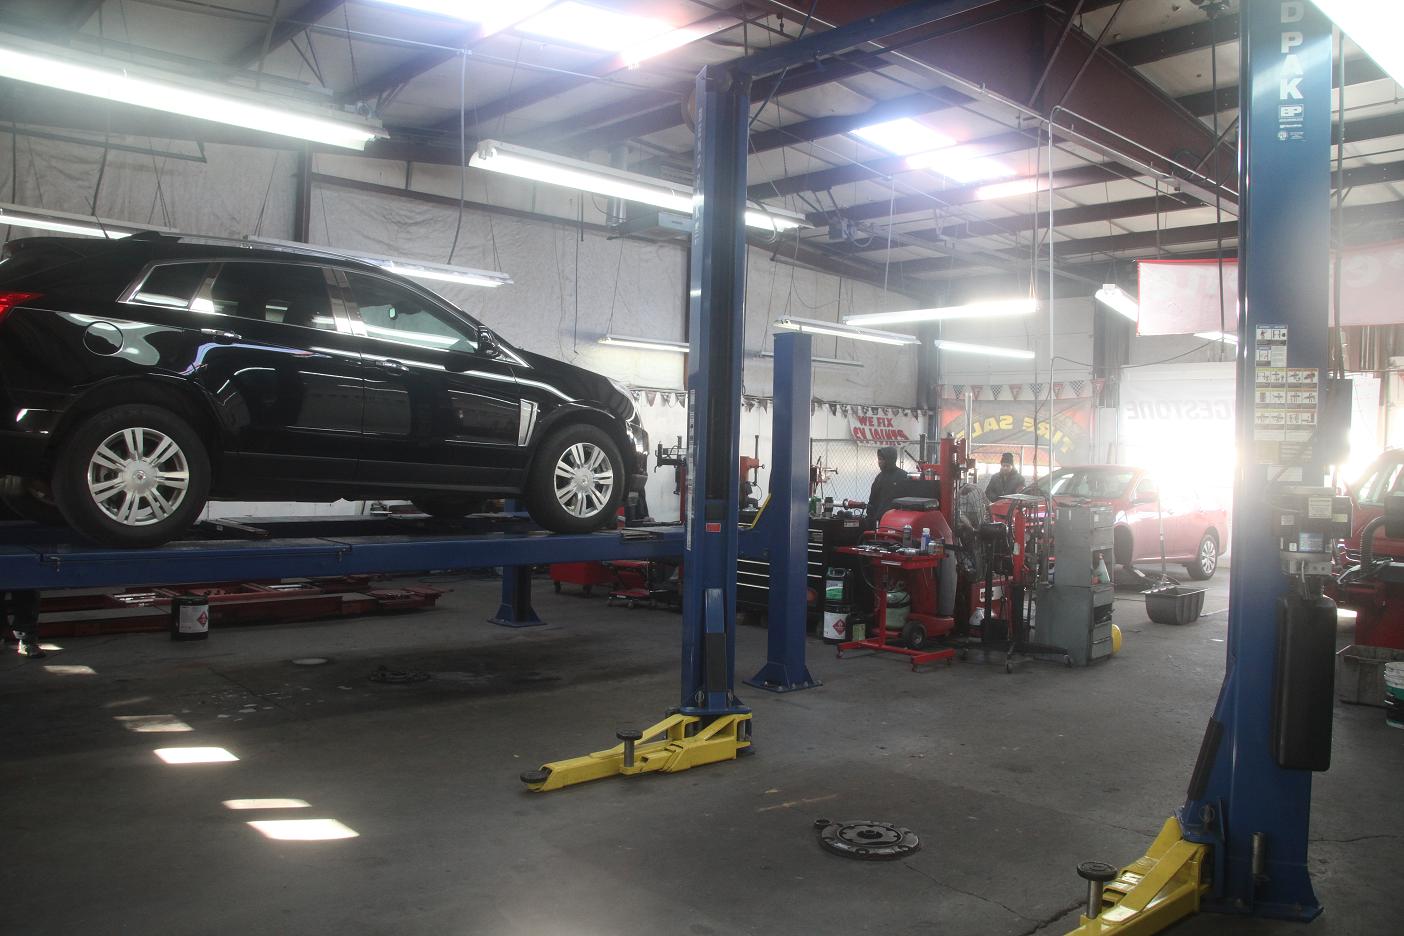 Auto Repair Shops Near Me in Duluth, Georgia | ShowMeLocal.com